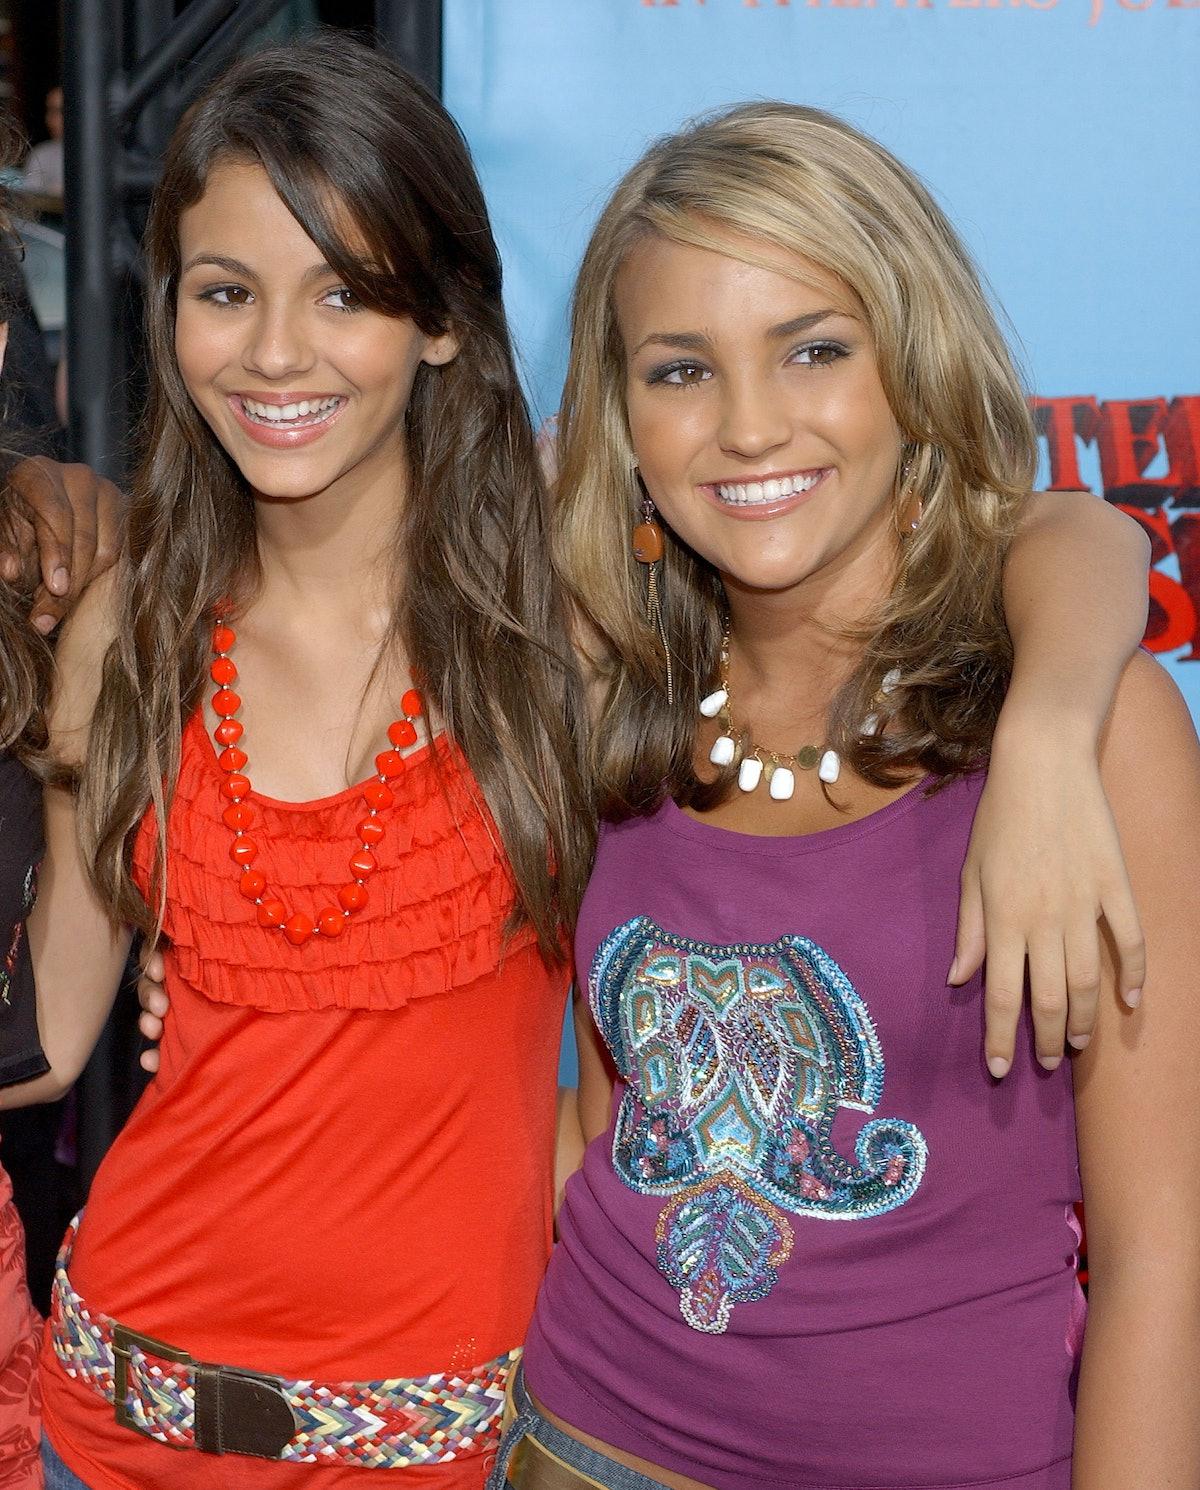 Are Victoria Justice & Jamie Lynn Spears Still Friends?